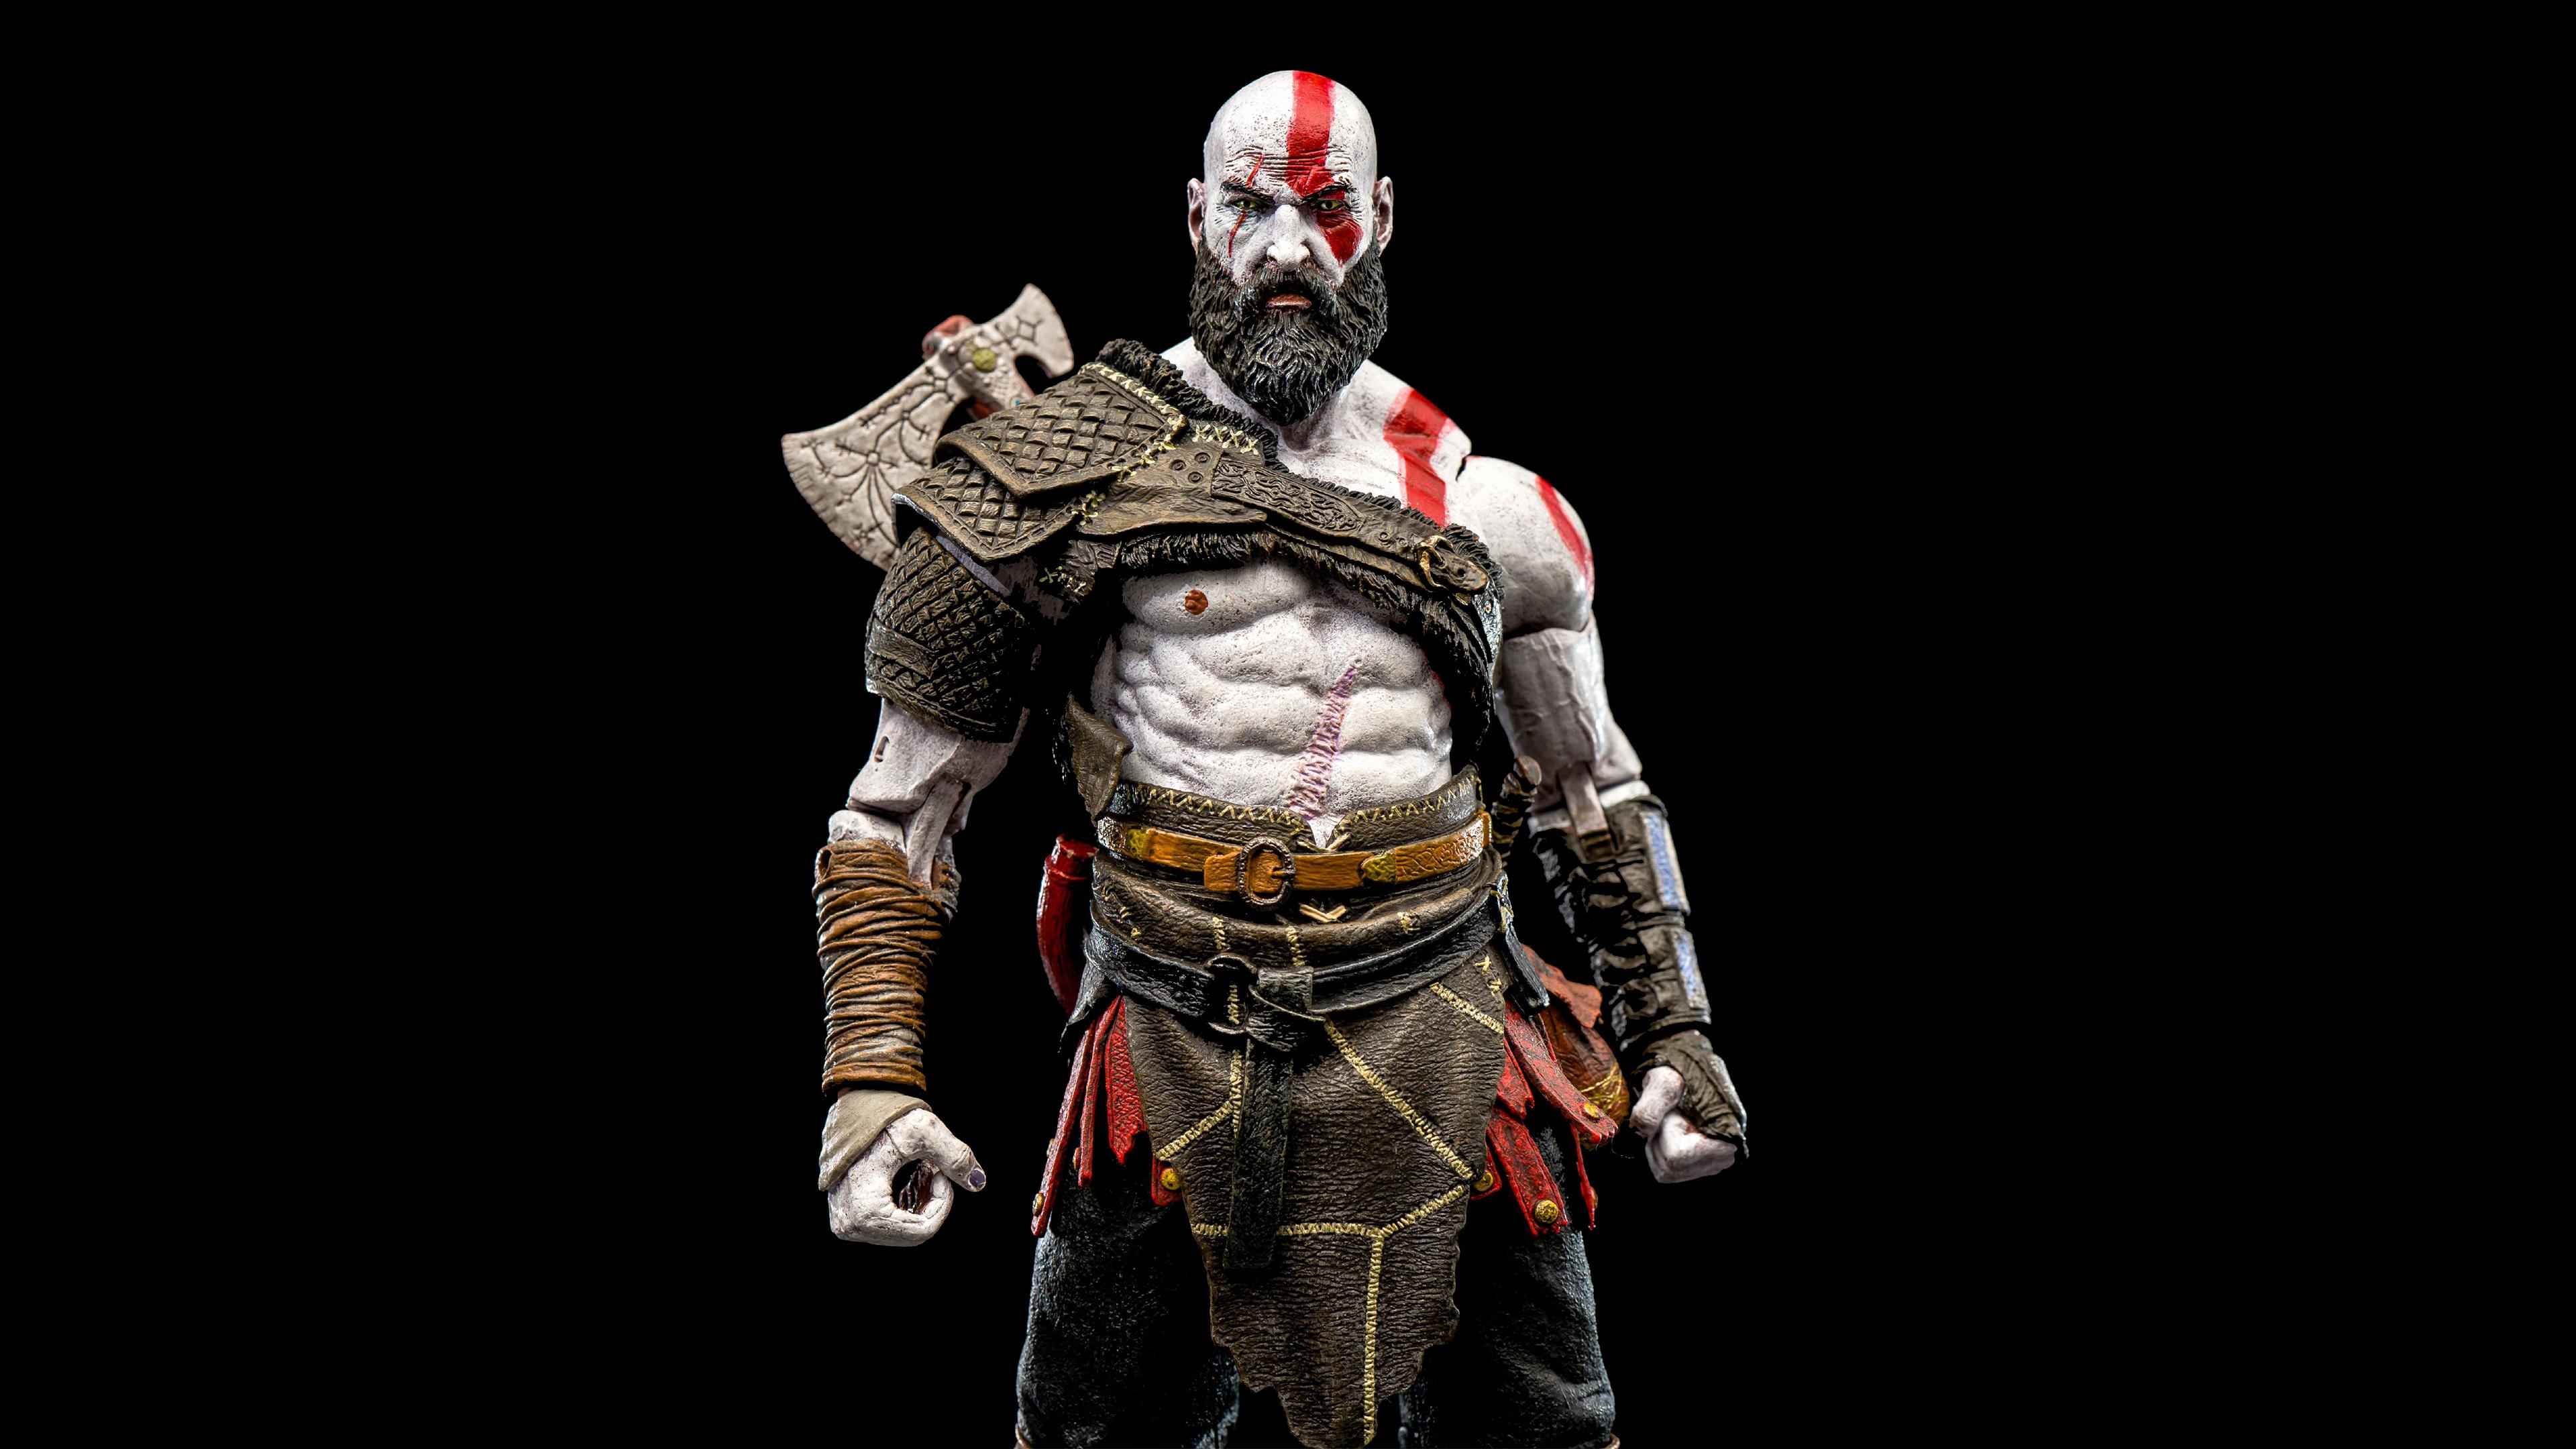 kratos 4k artwork 1536523752 - Kratos 4k Artwork - ps games wallpapers, kratos wallpapers, hd-wallpapers, god of war wallpapers, god of war 4 wallpapers, games wallpapers, artwork wallpapers, 4k-wallpapers